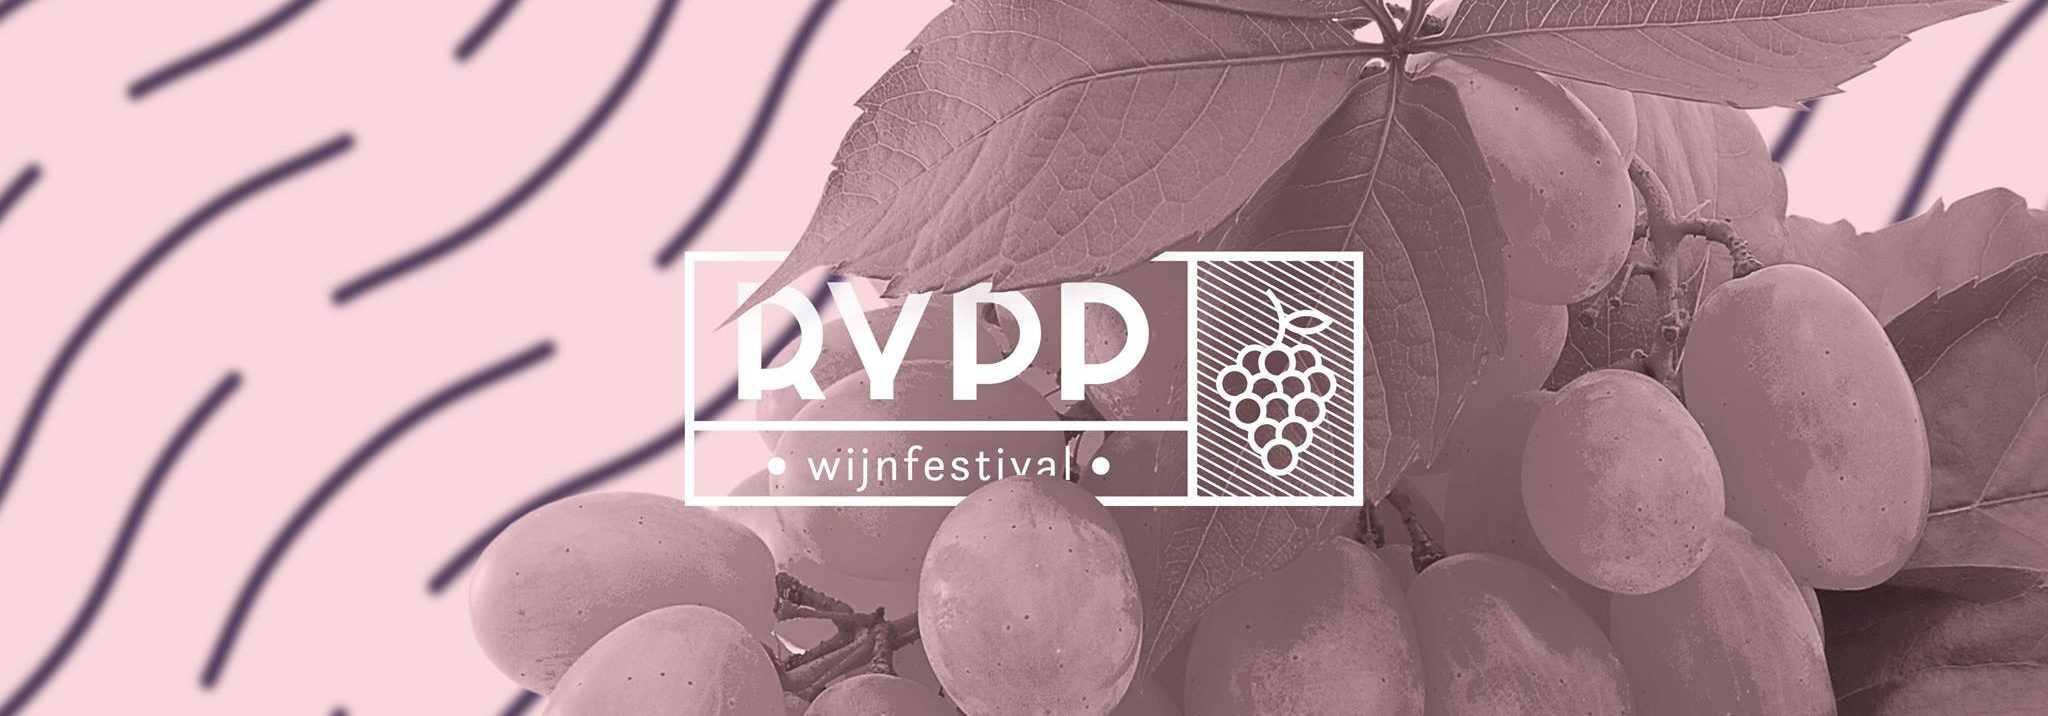 Dit weekend: RYPP Wijnfestival in Rotterdam